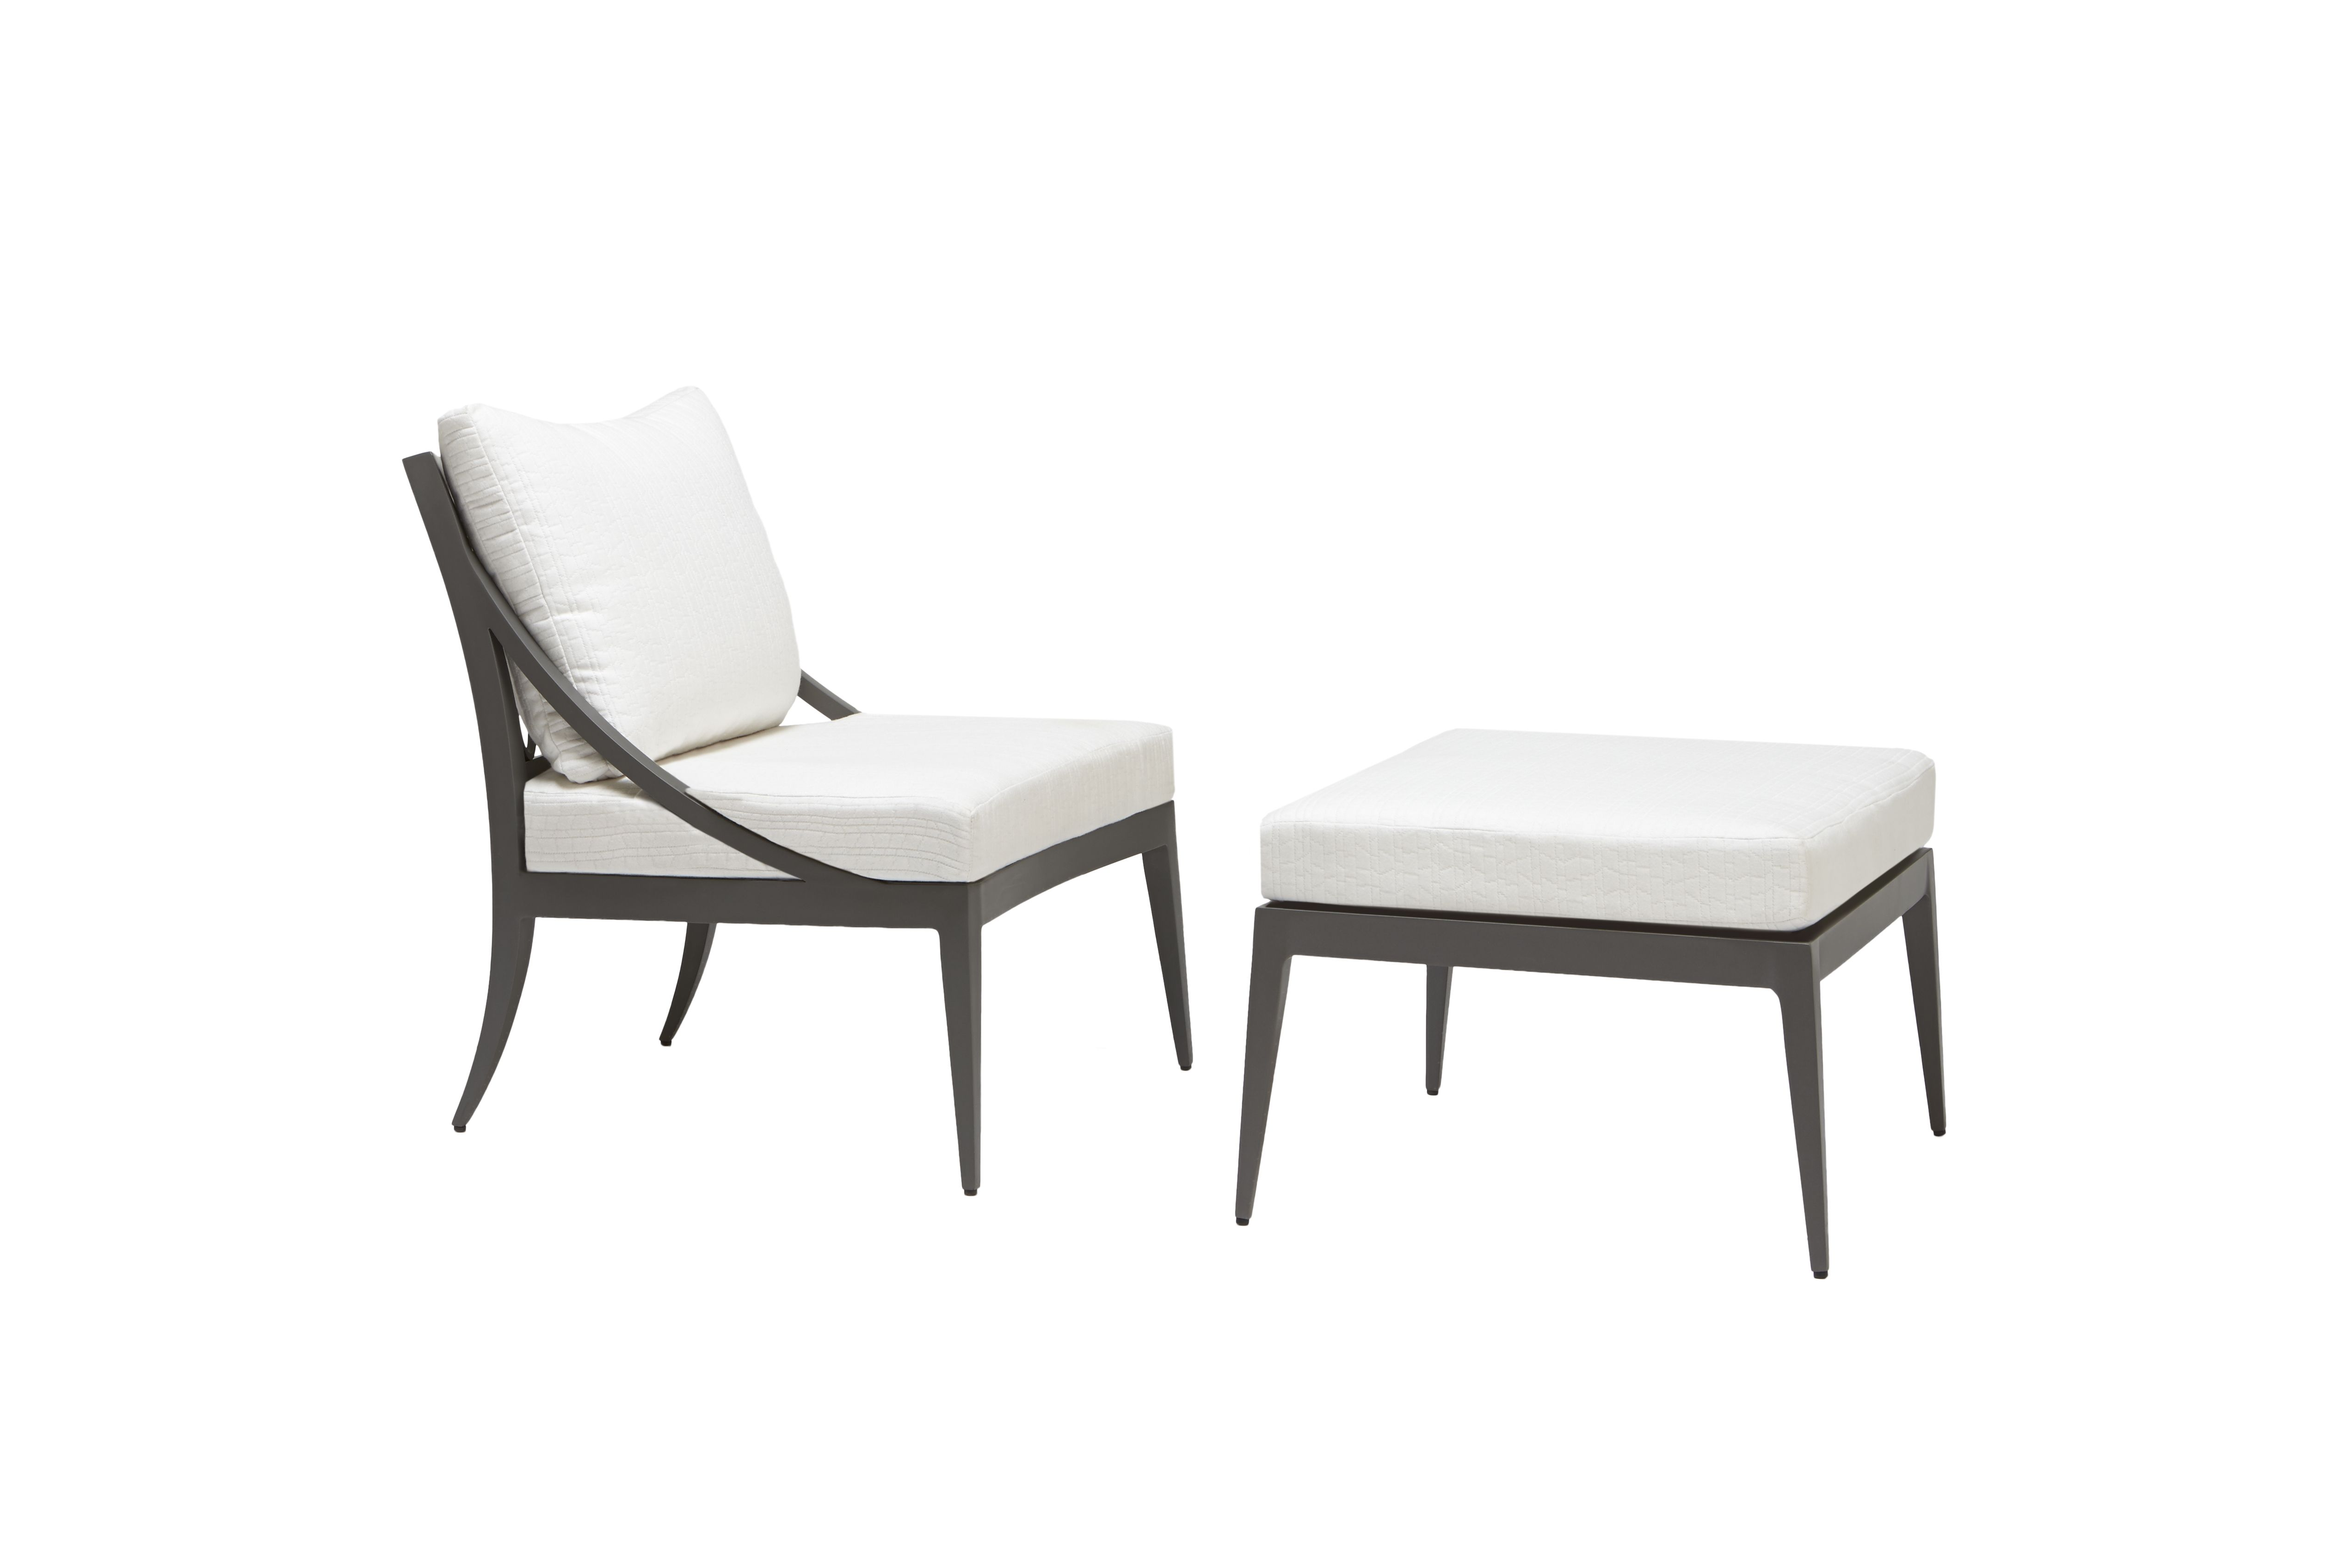 related image client kpda brown jordan chair furniture rh pinterest com